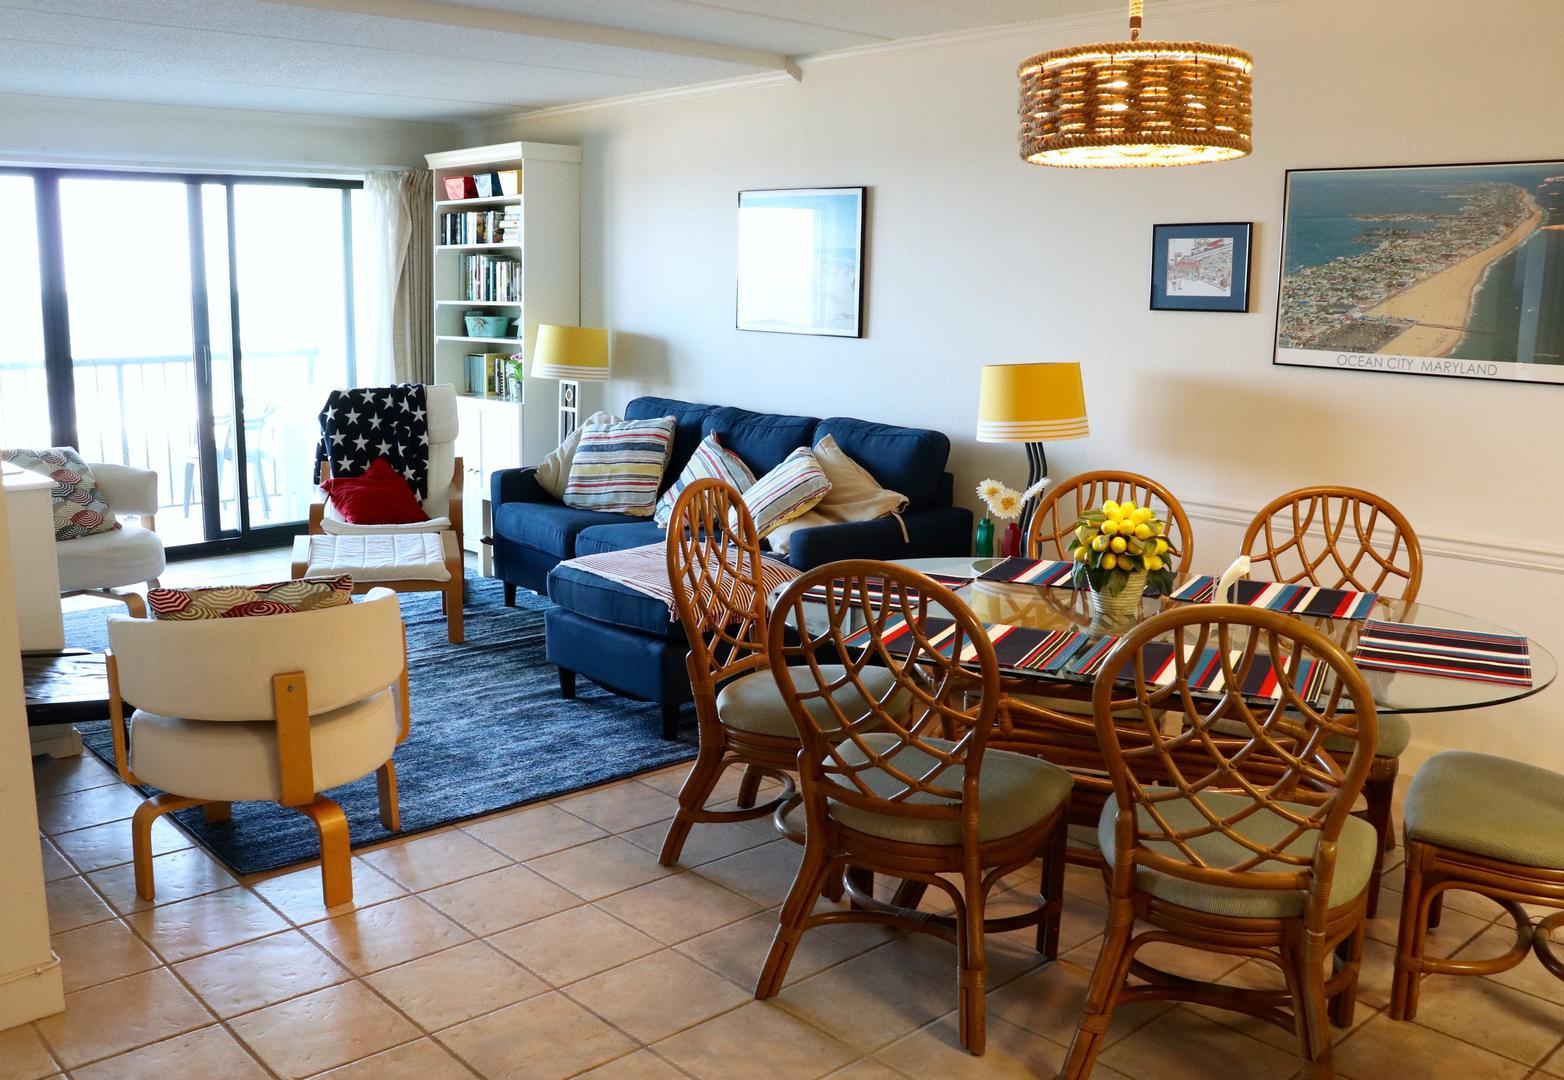 Living - Dining Room